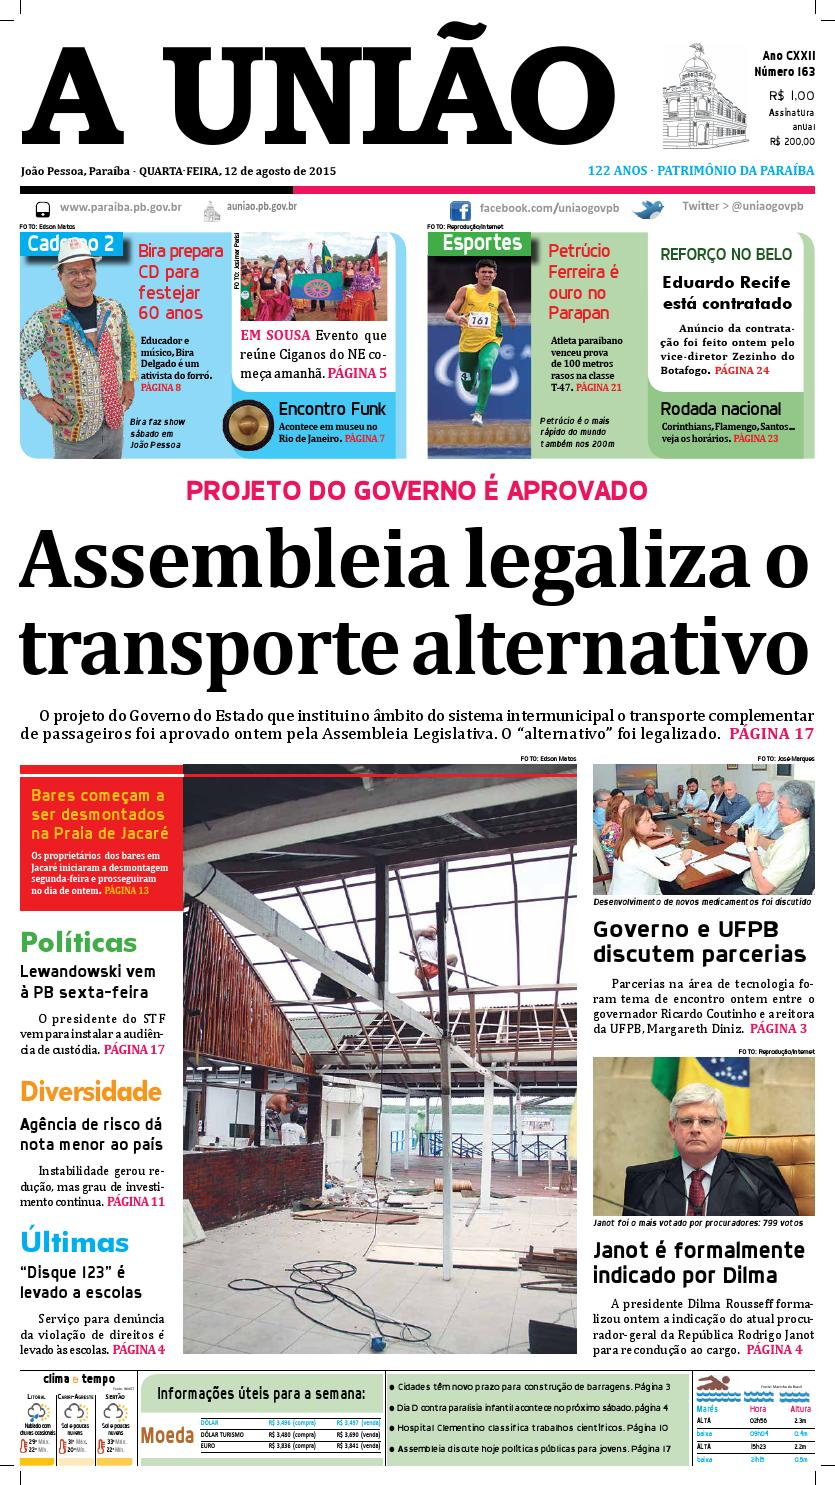 Jornal A União - 12 08 2015 by Jornal A União - issuu 71adc222d83b5